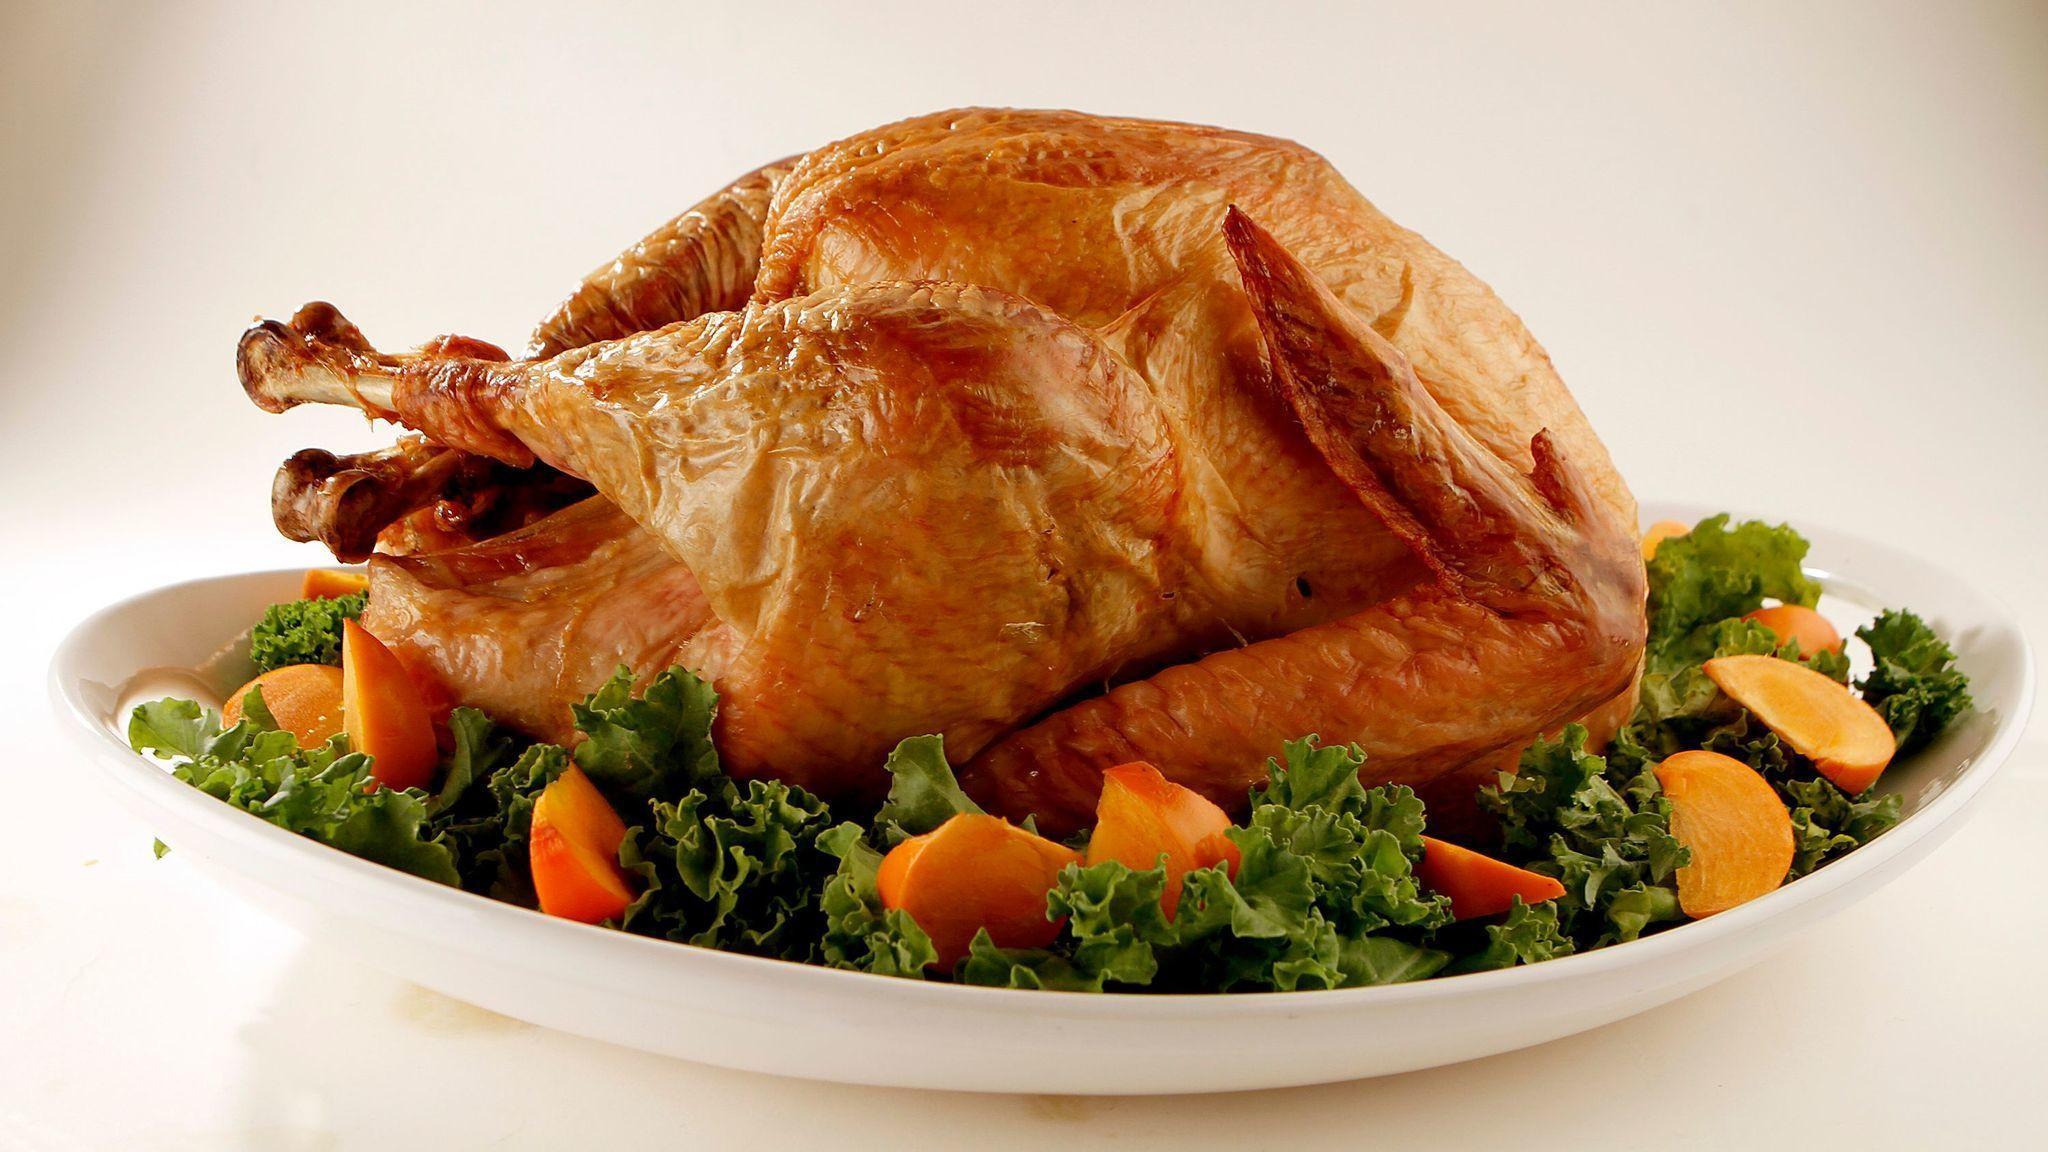 Cooking A Thanksgiving Turkey  A beginner s guide to cooking a Thanksgiving turkey LA Times